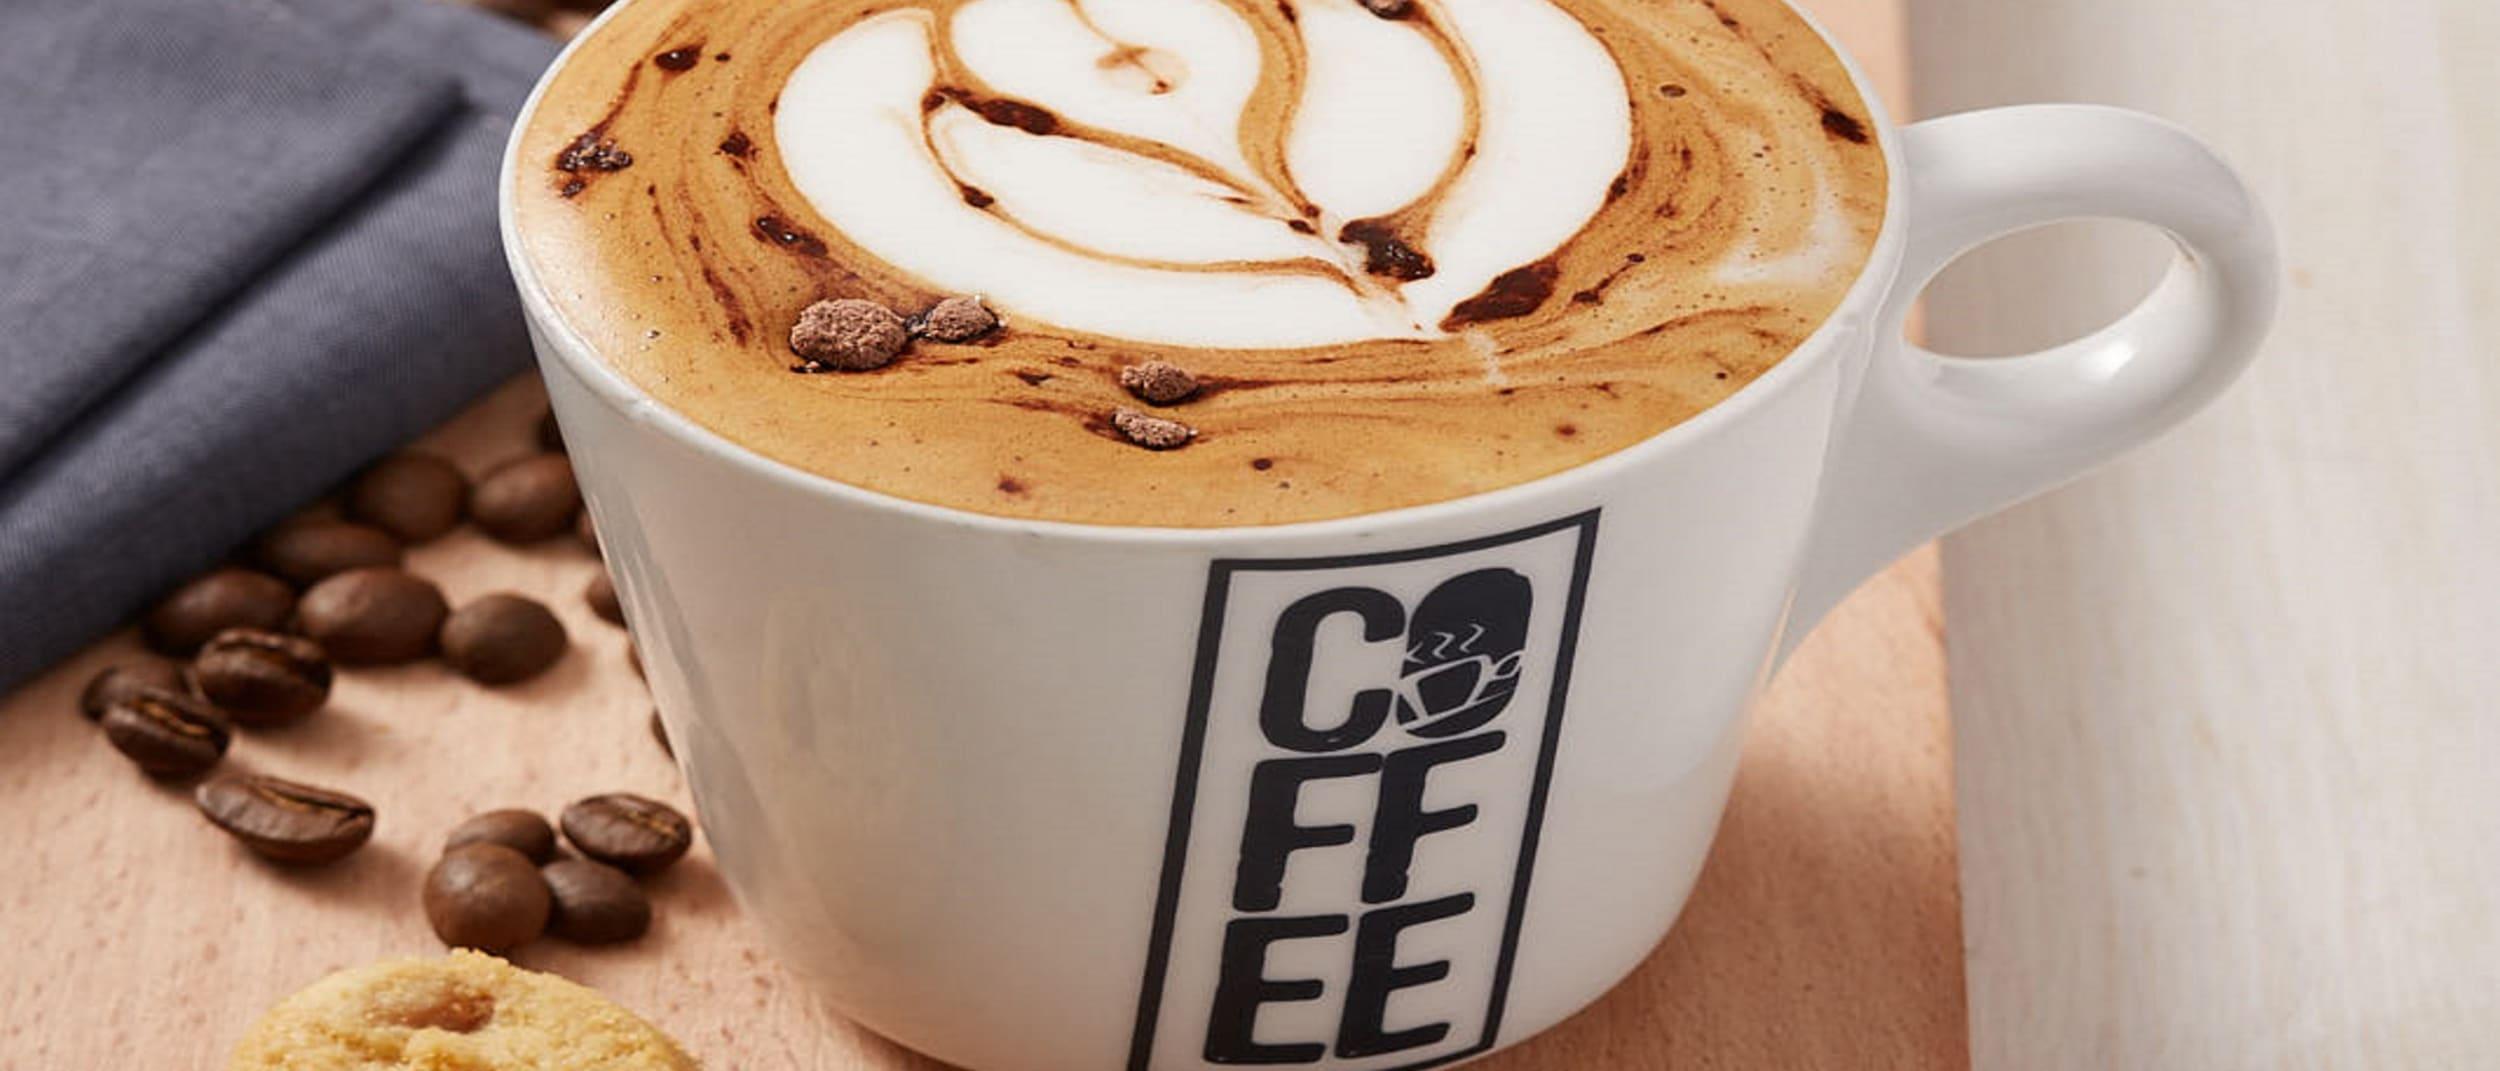 Jamaica Blue: El Salvador Premium Single Origin coffee